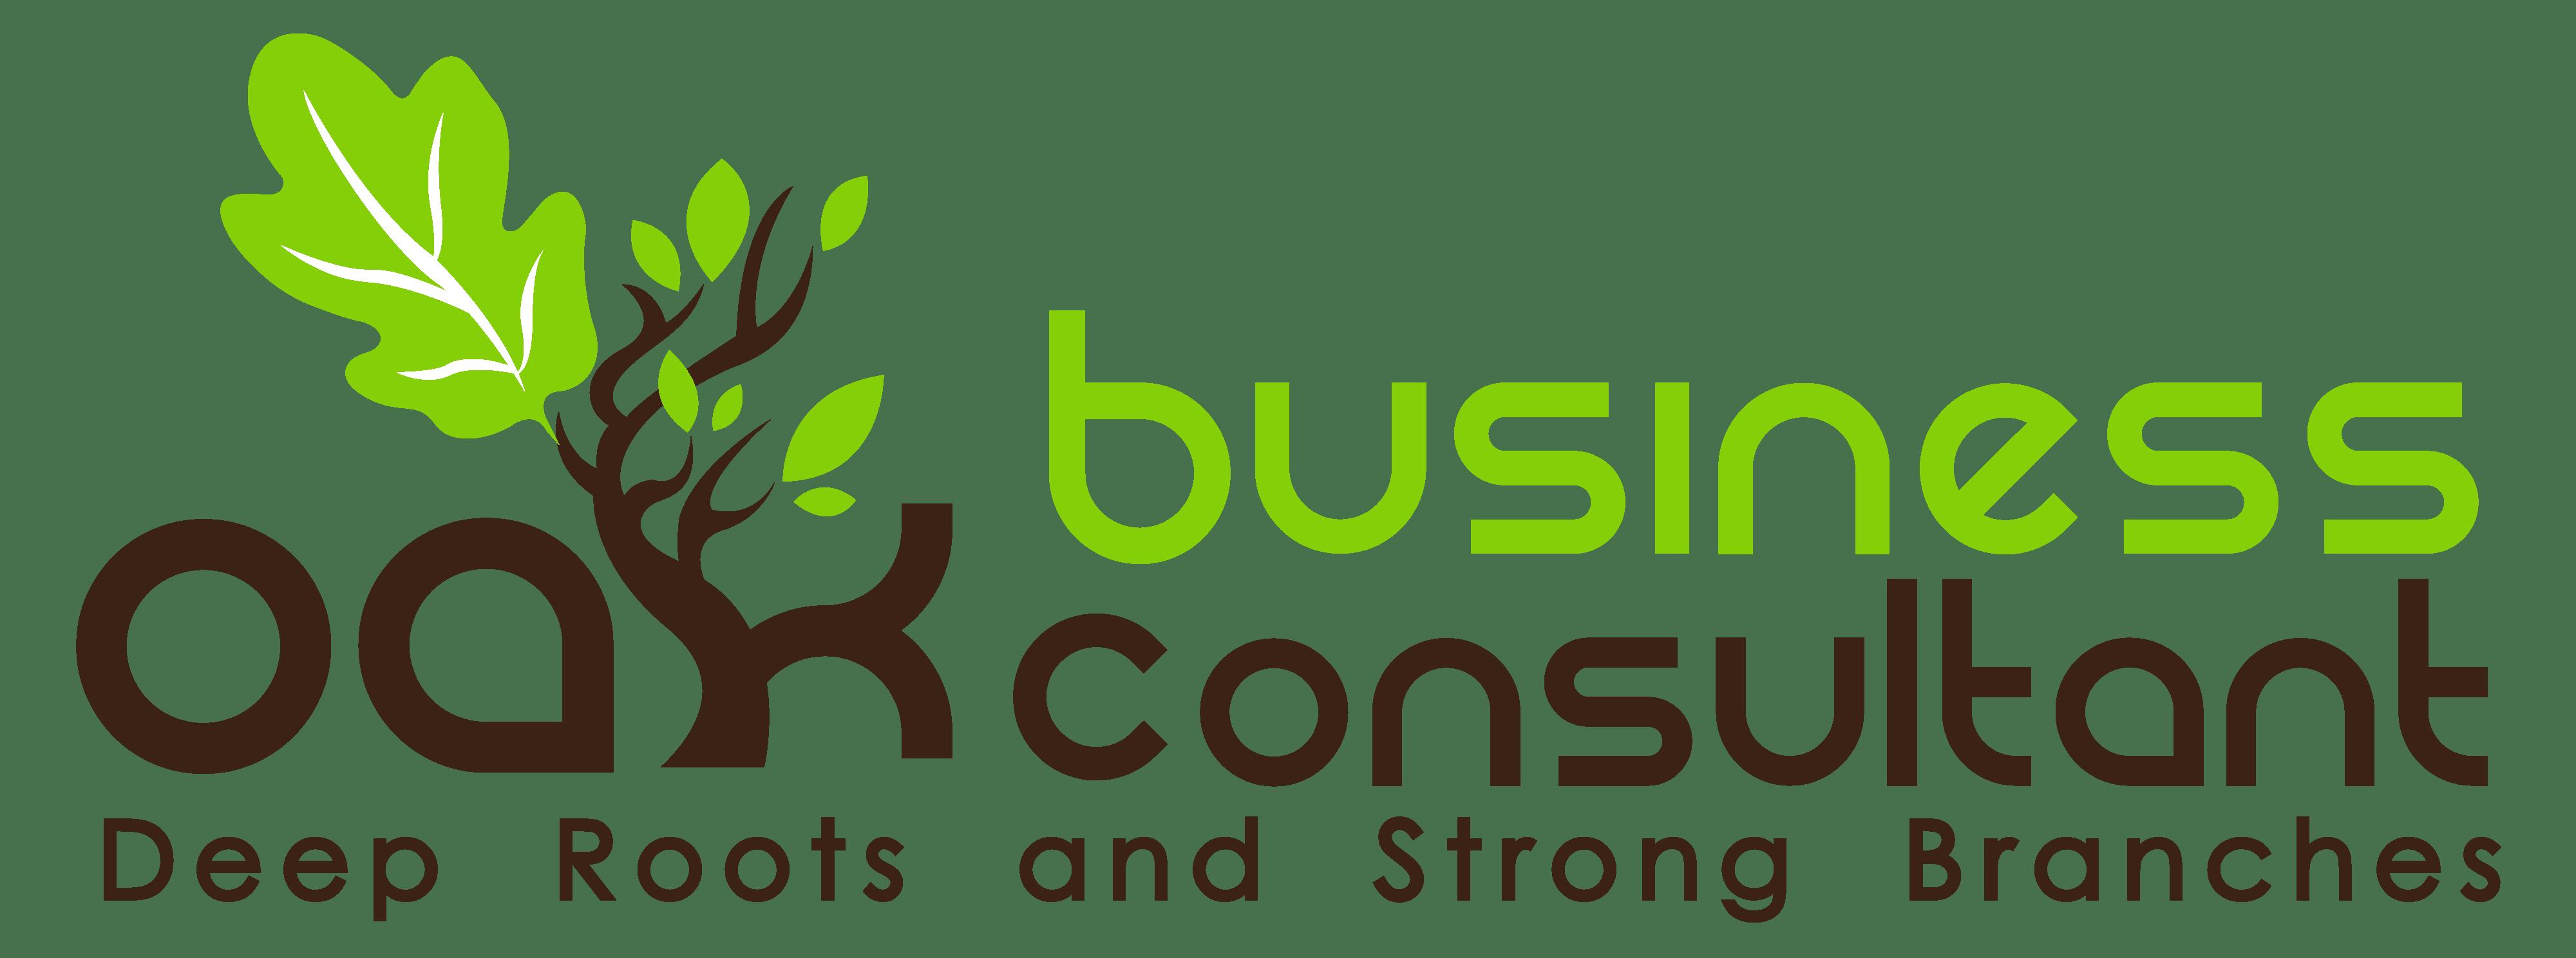 Oak Business Consultant